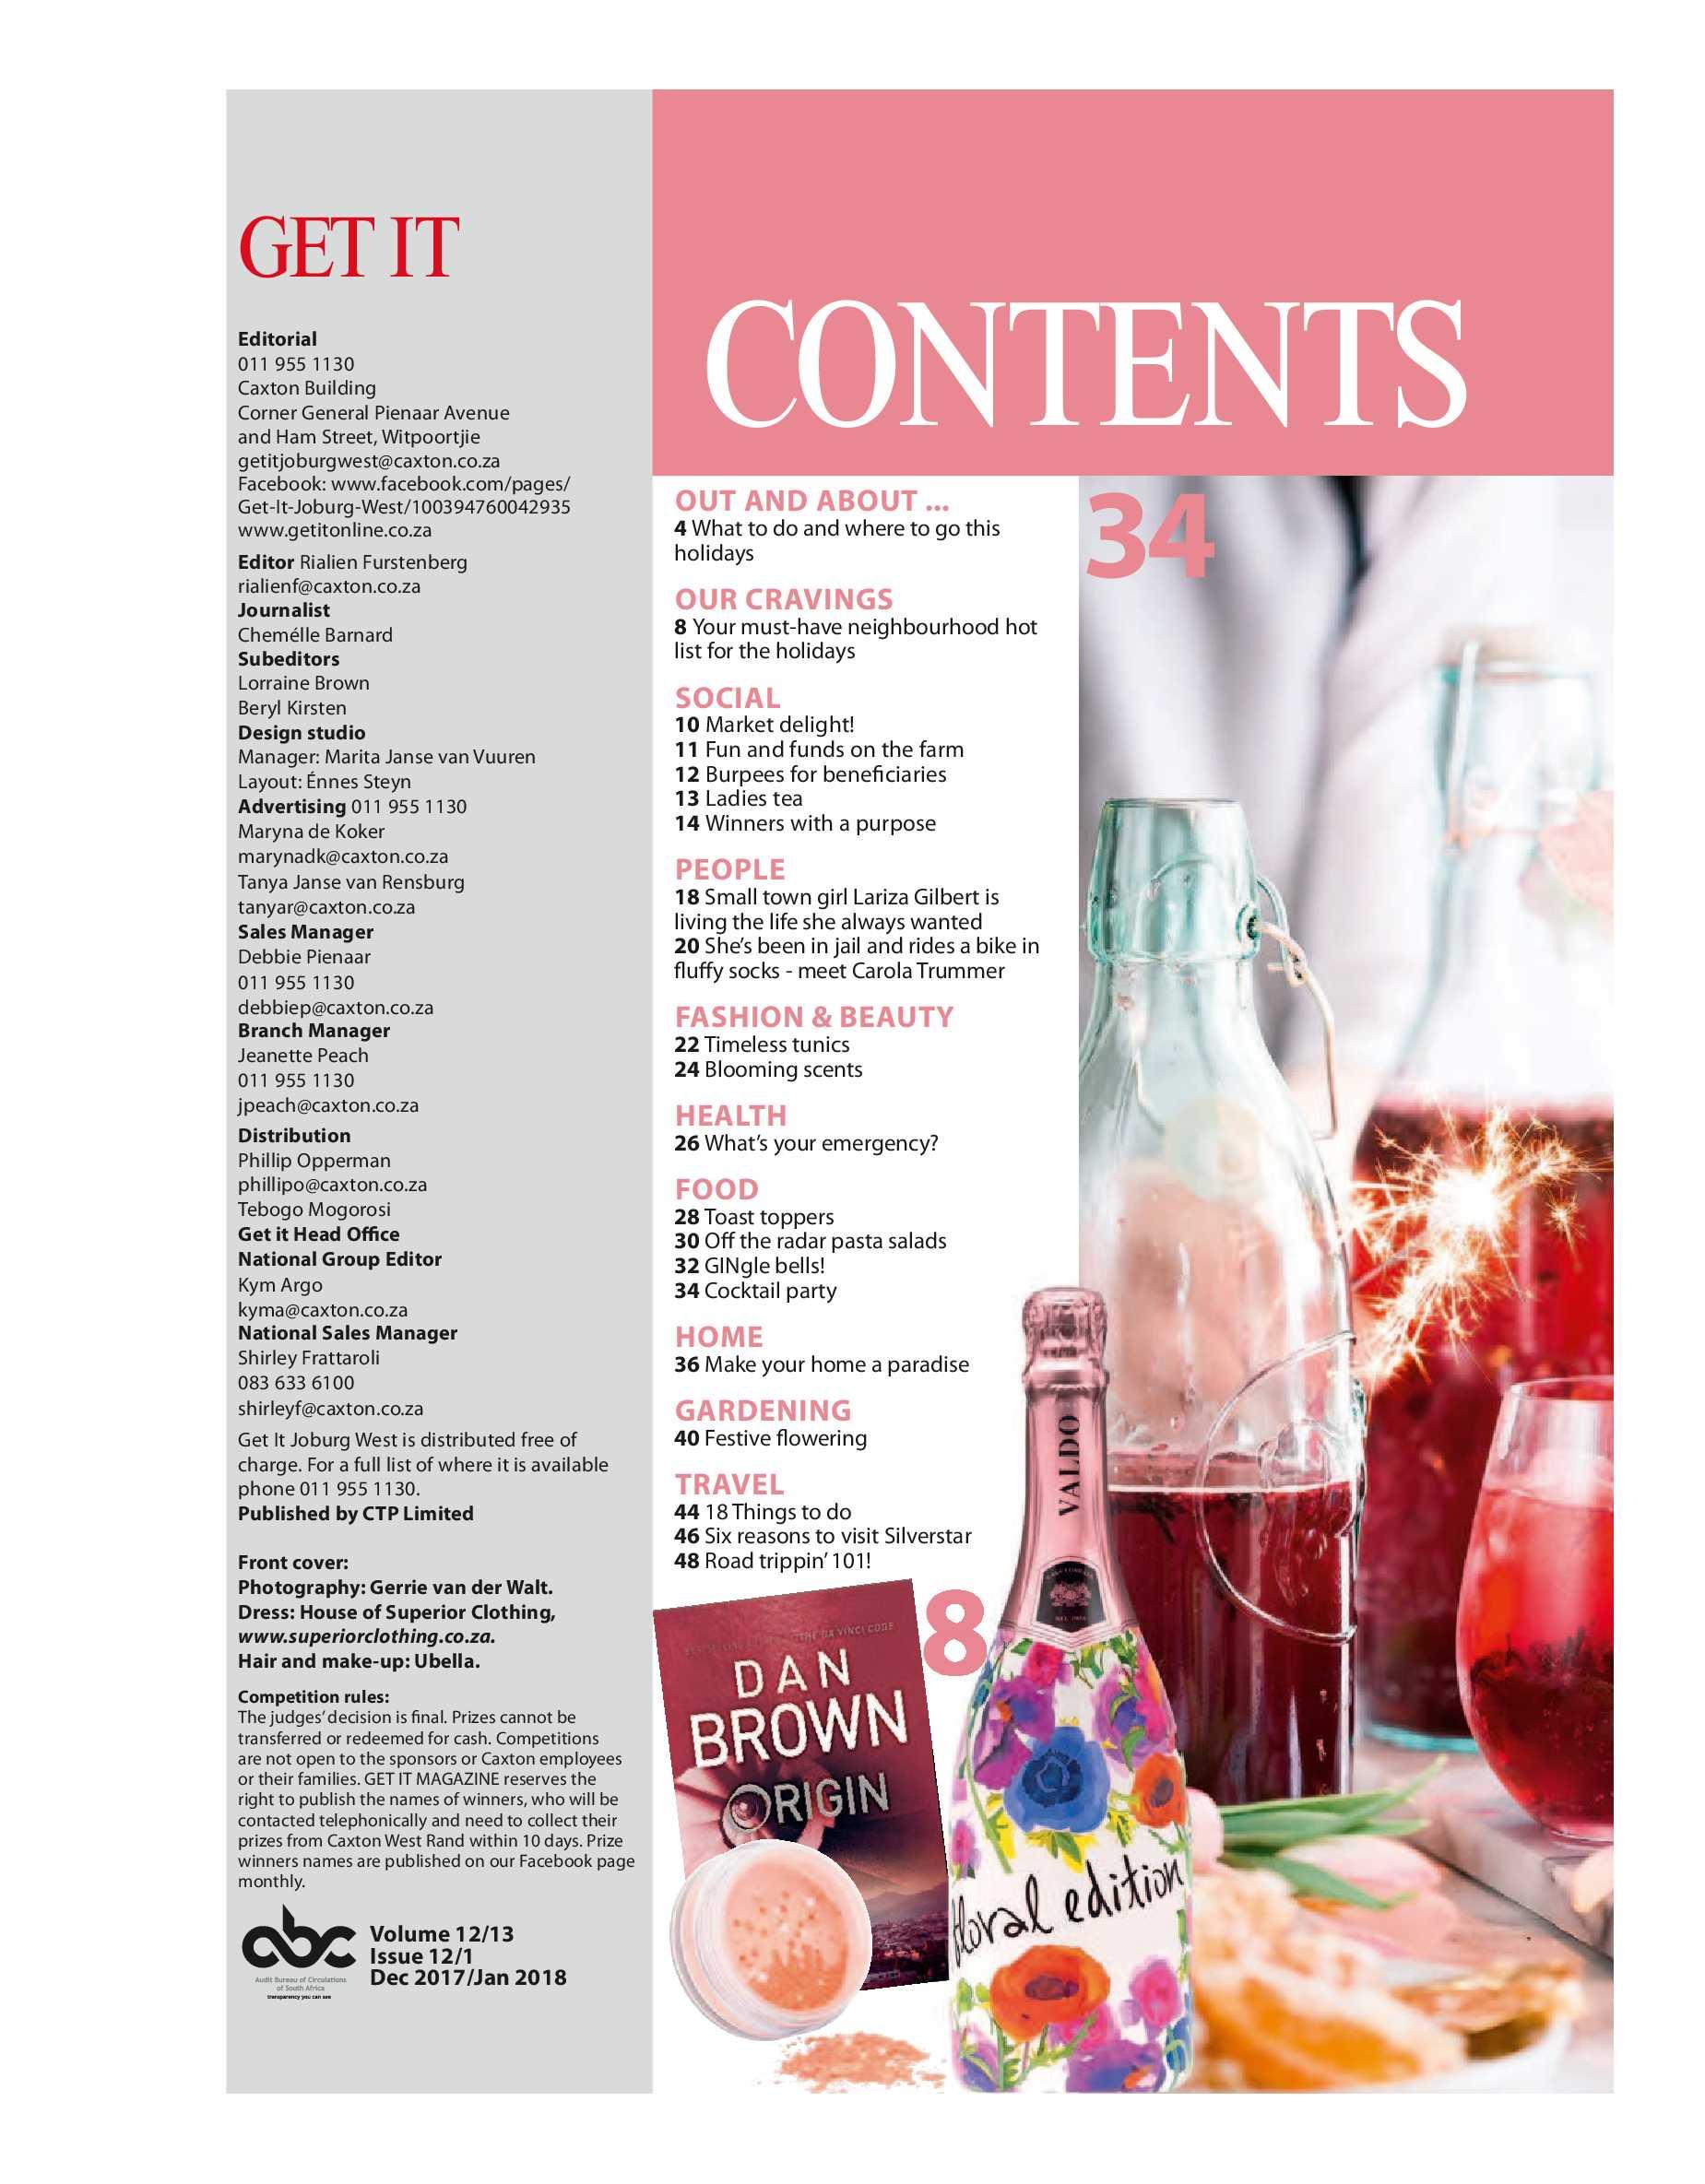 get-joburg-west-dec-2017-jan-2018-epapers-page-3